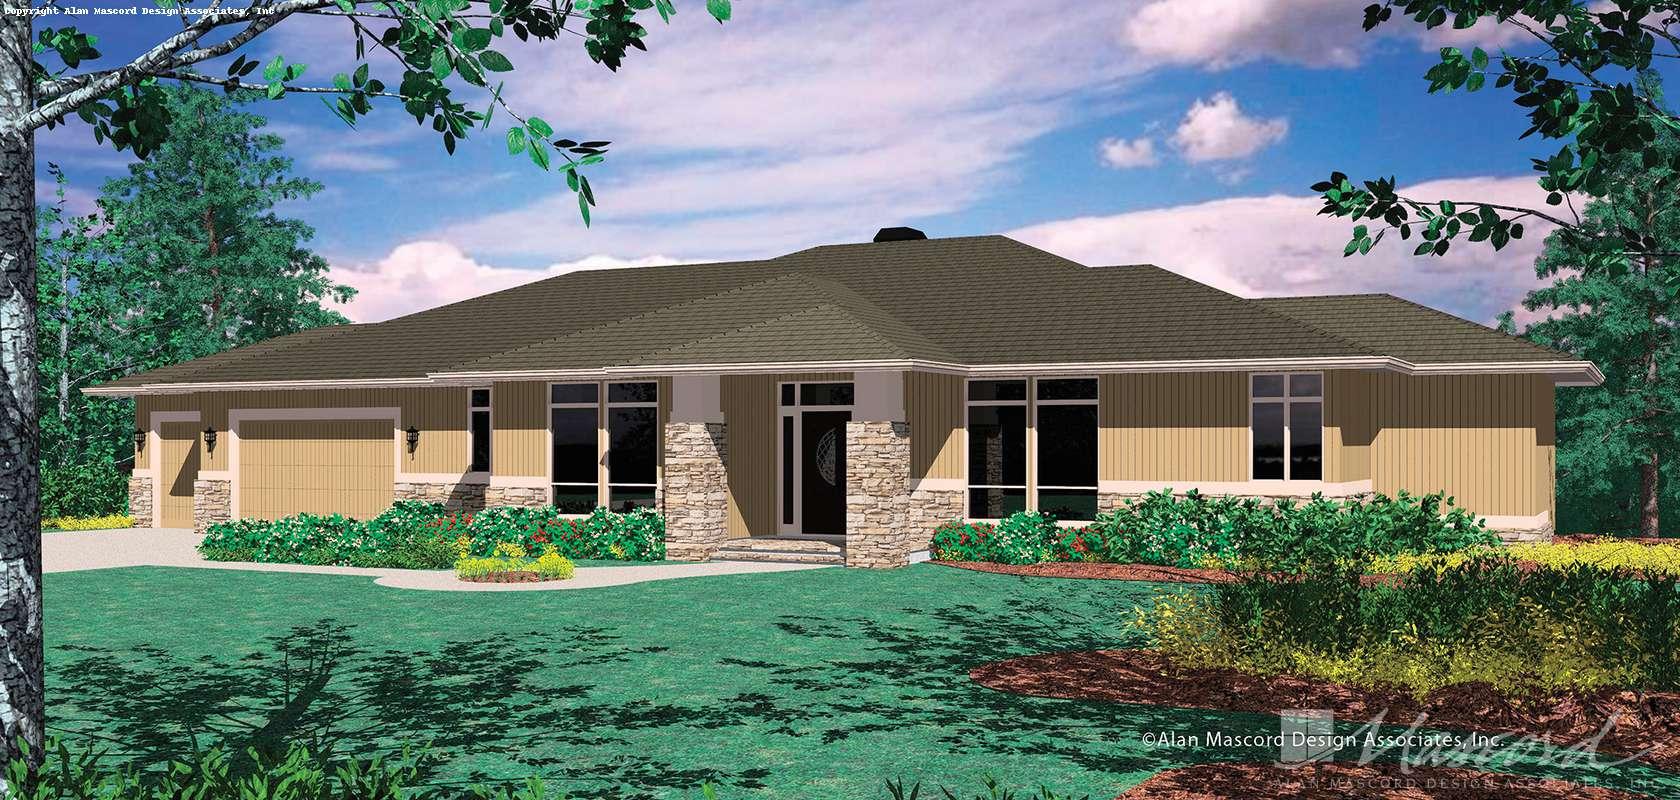 Mascord House Plan 1405: The Jalena